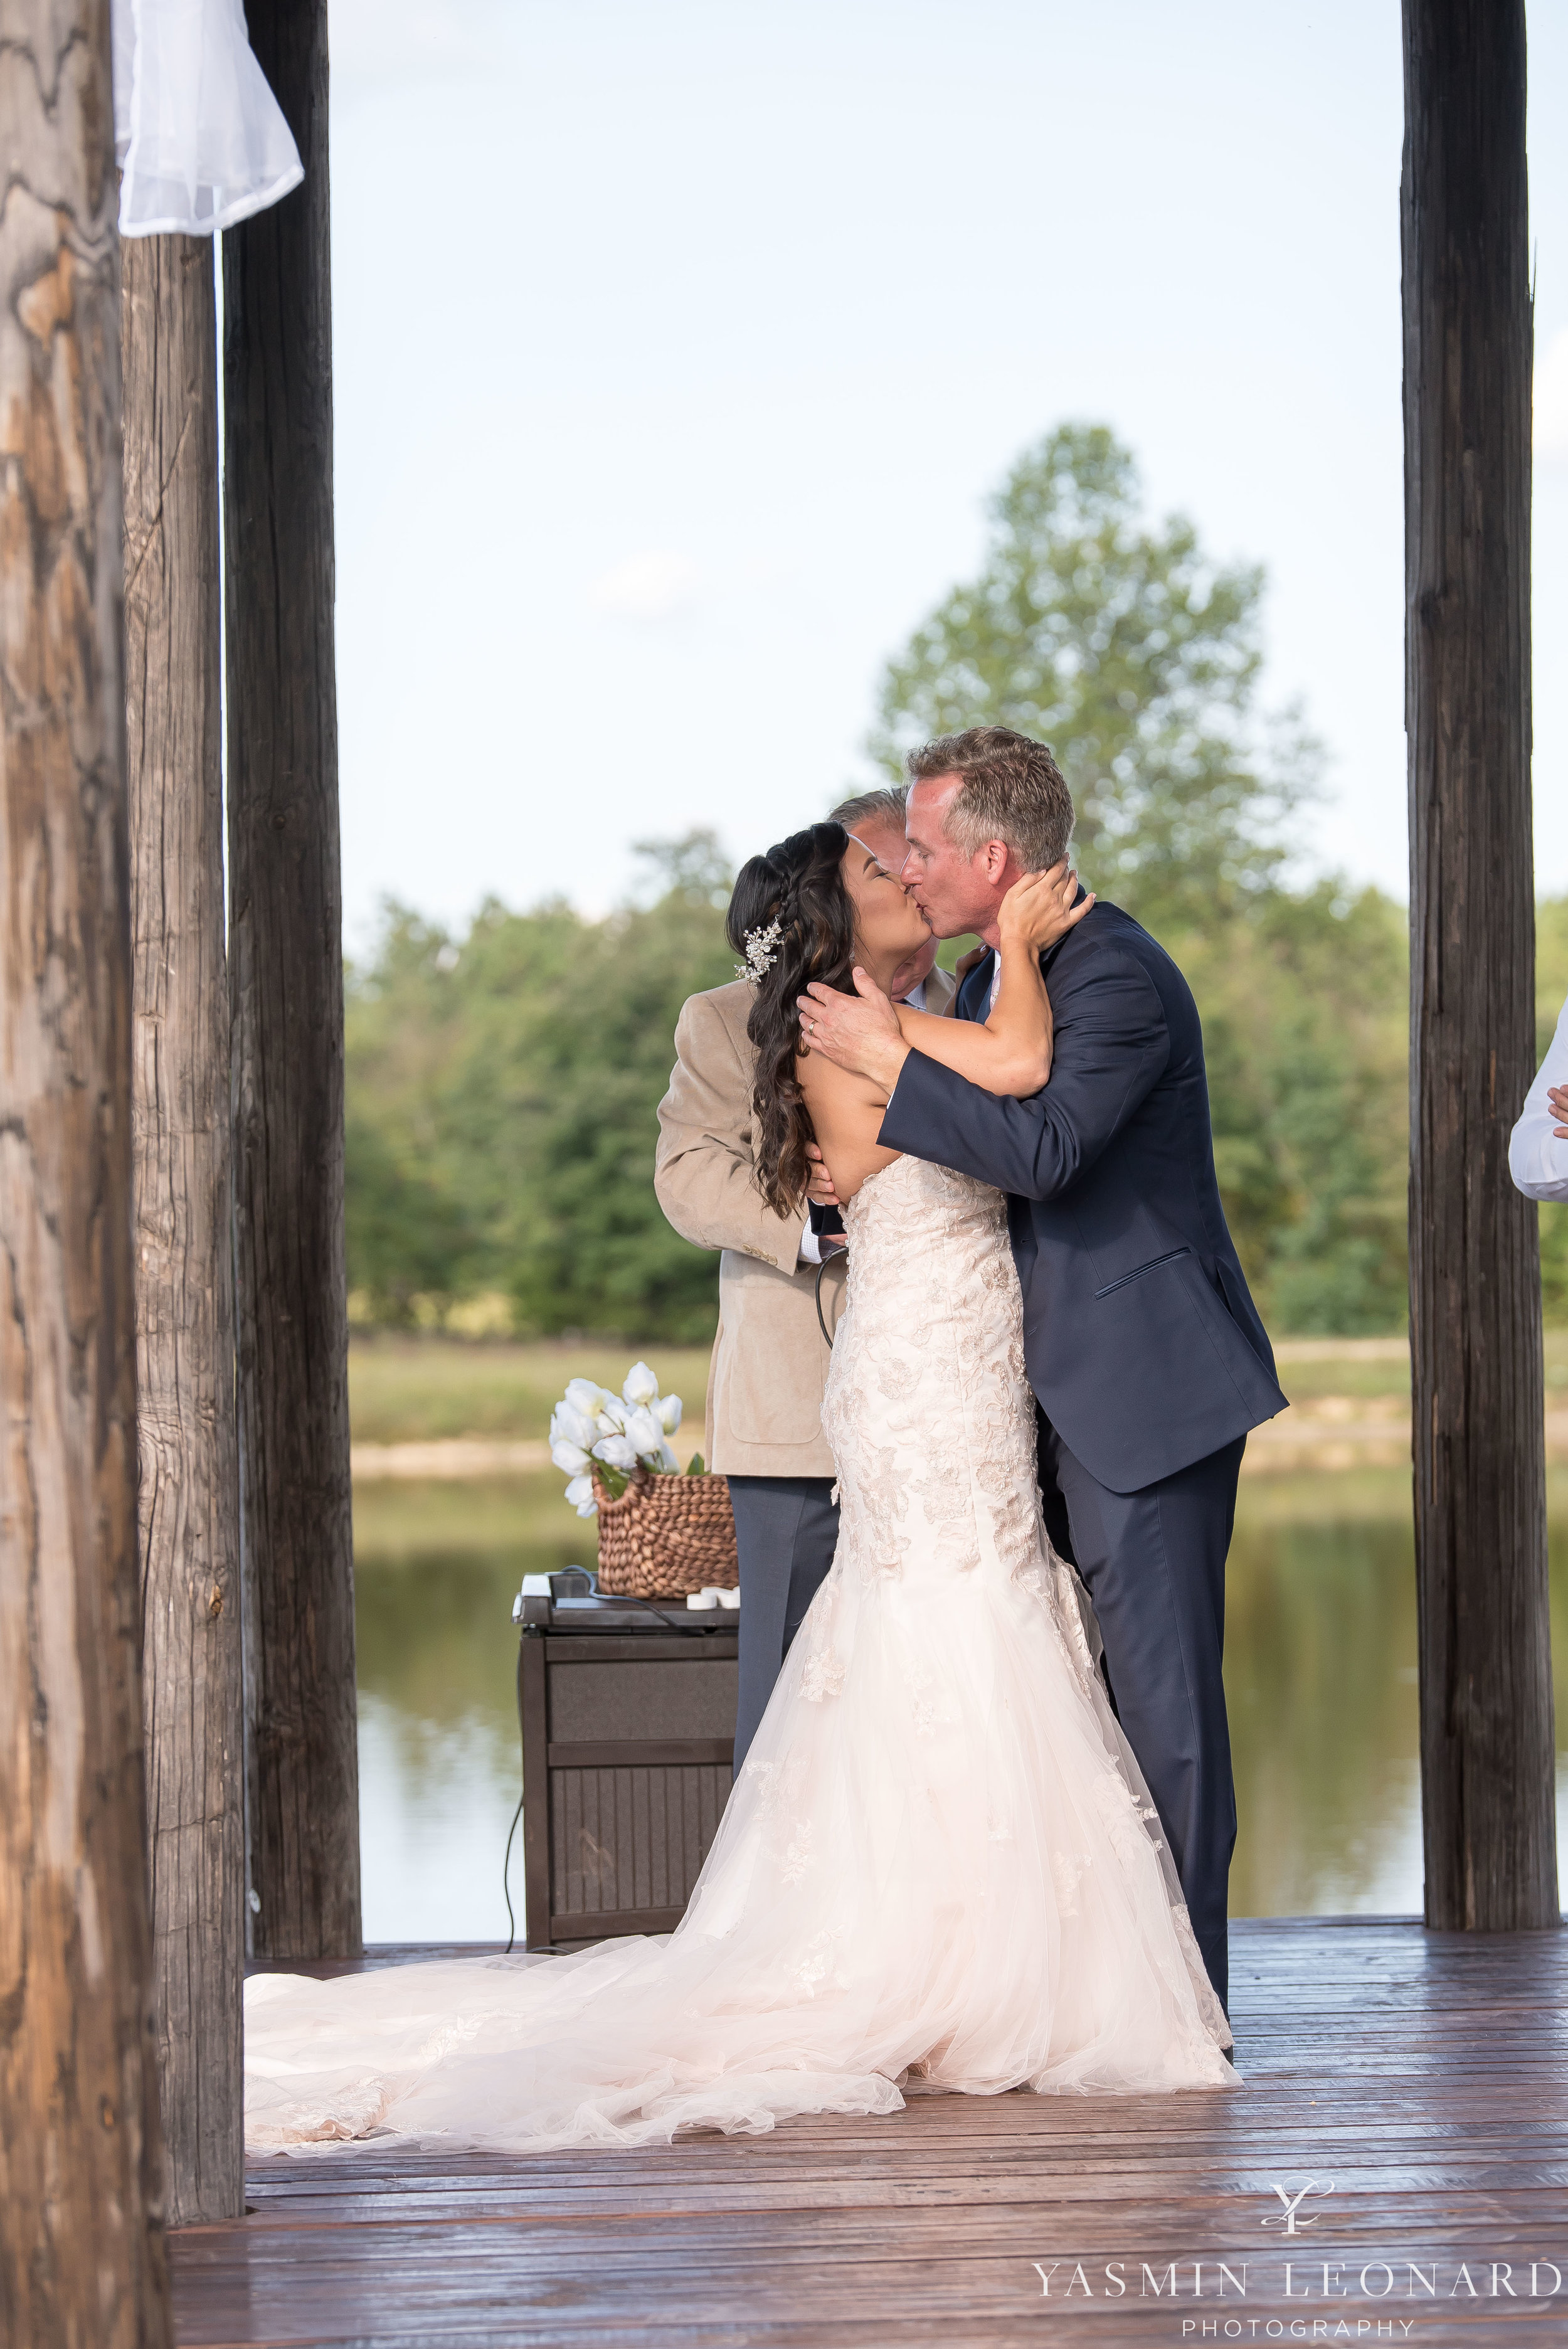 Mason Ridge   Liberty, NC   Aylissa and John   Yasmin Leonard Photography-59.jpg